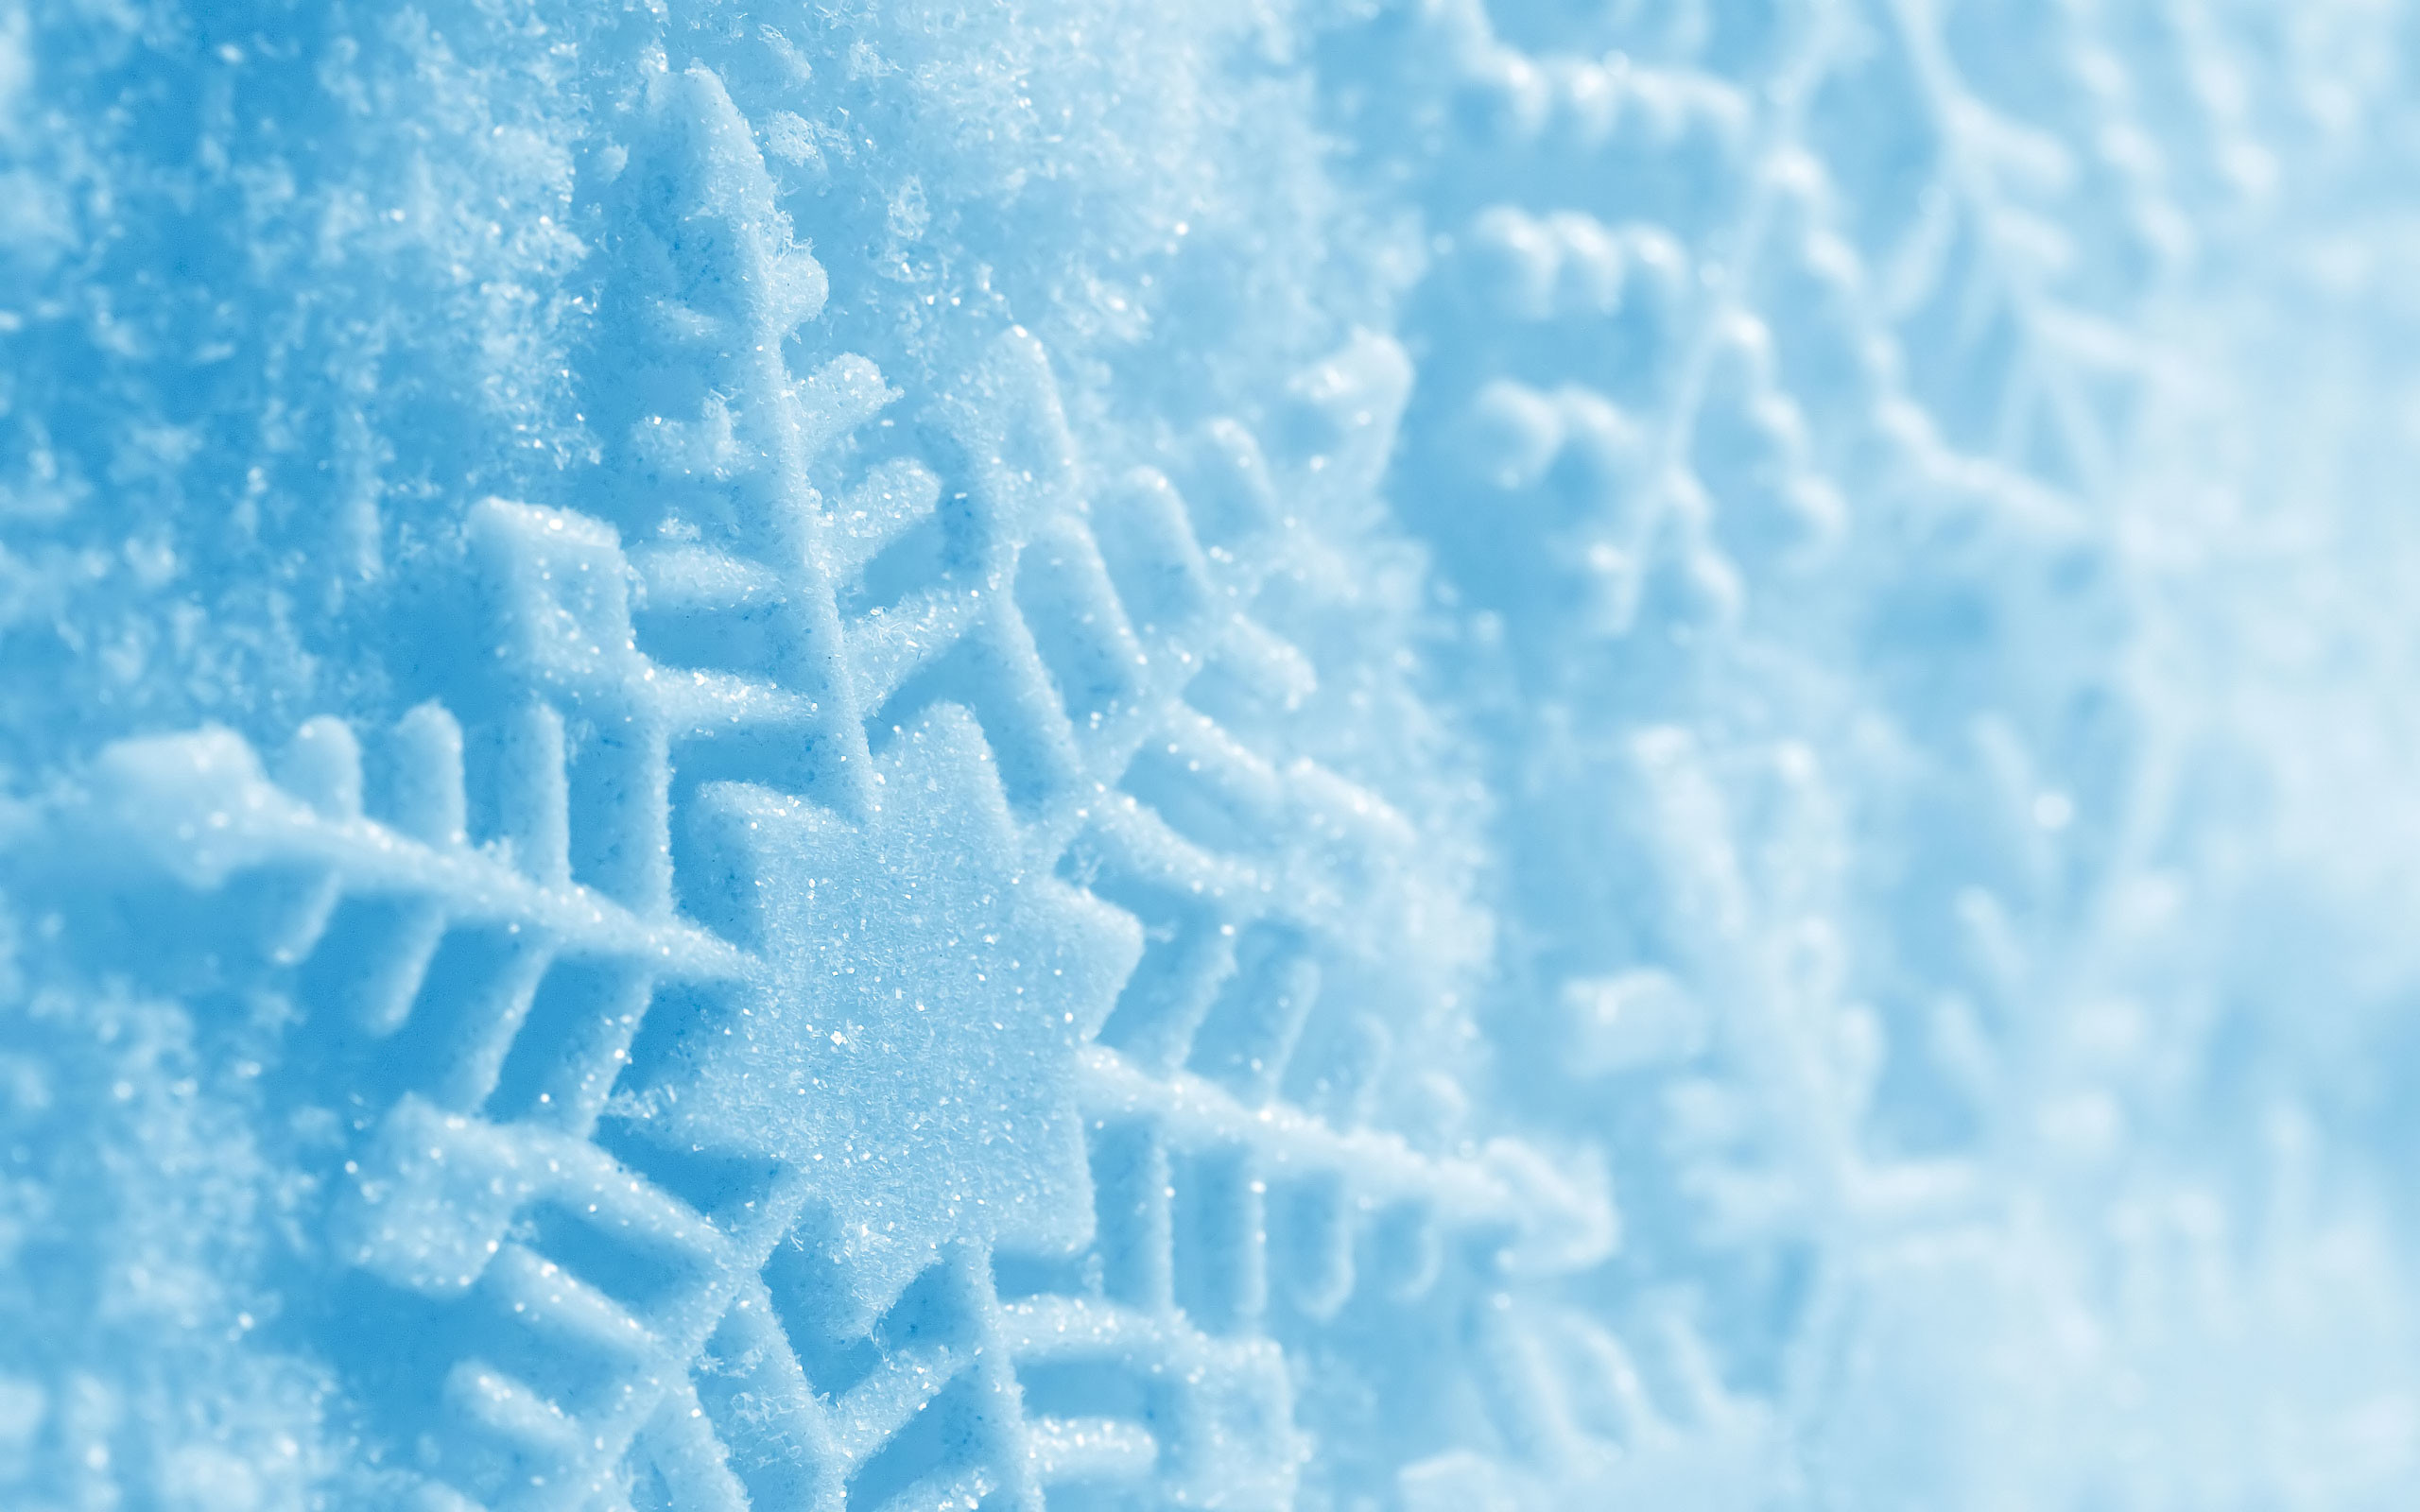 Snow Background, wallpaper, Snow Background hd wallpaper, background .